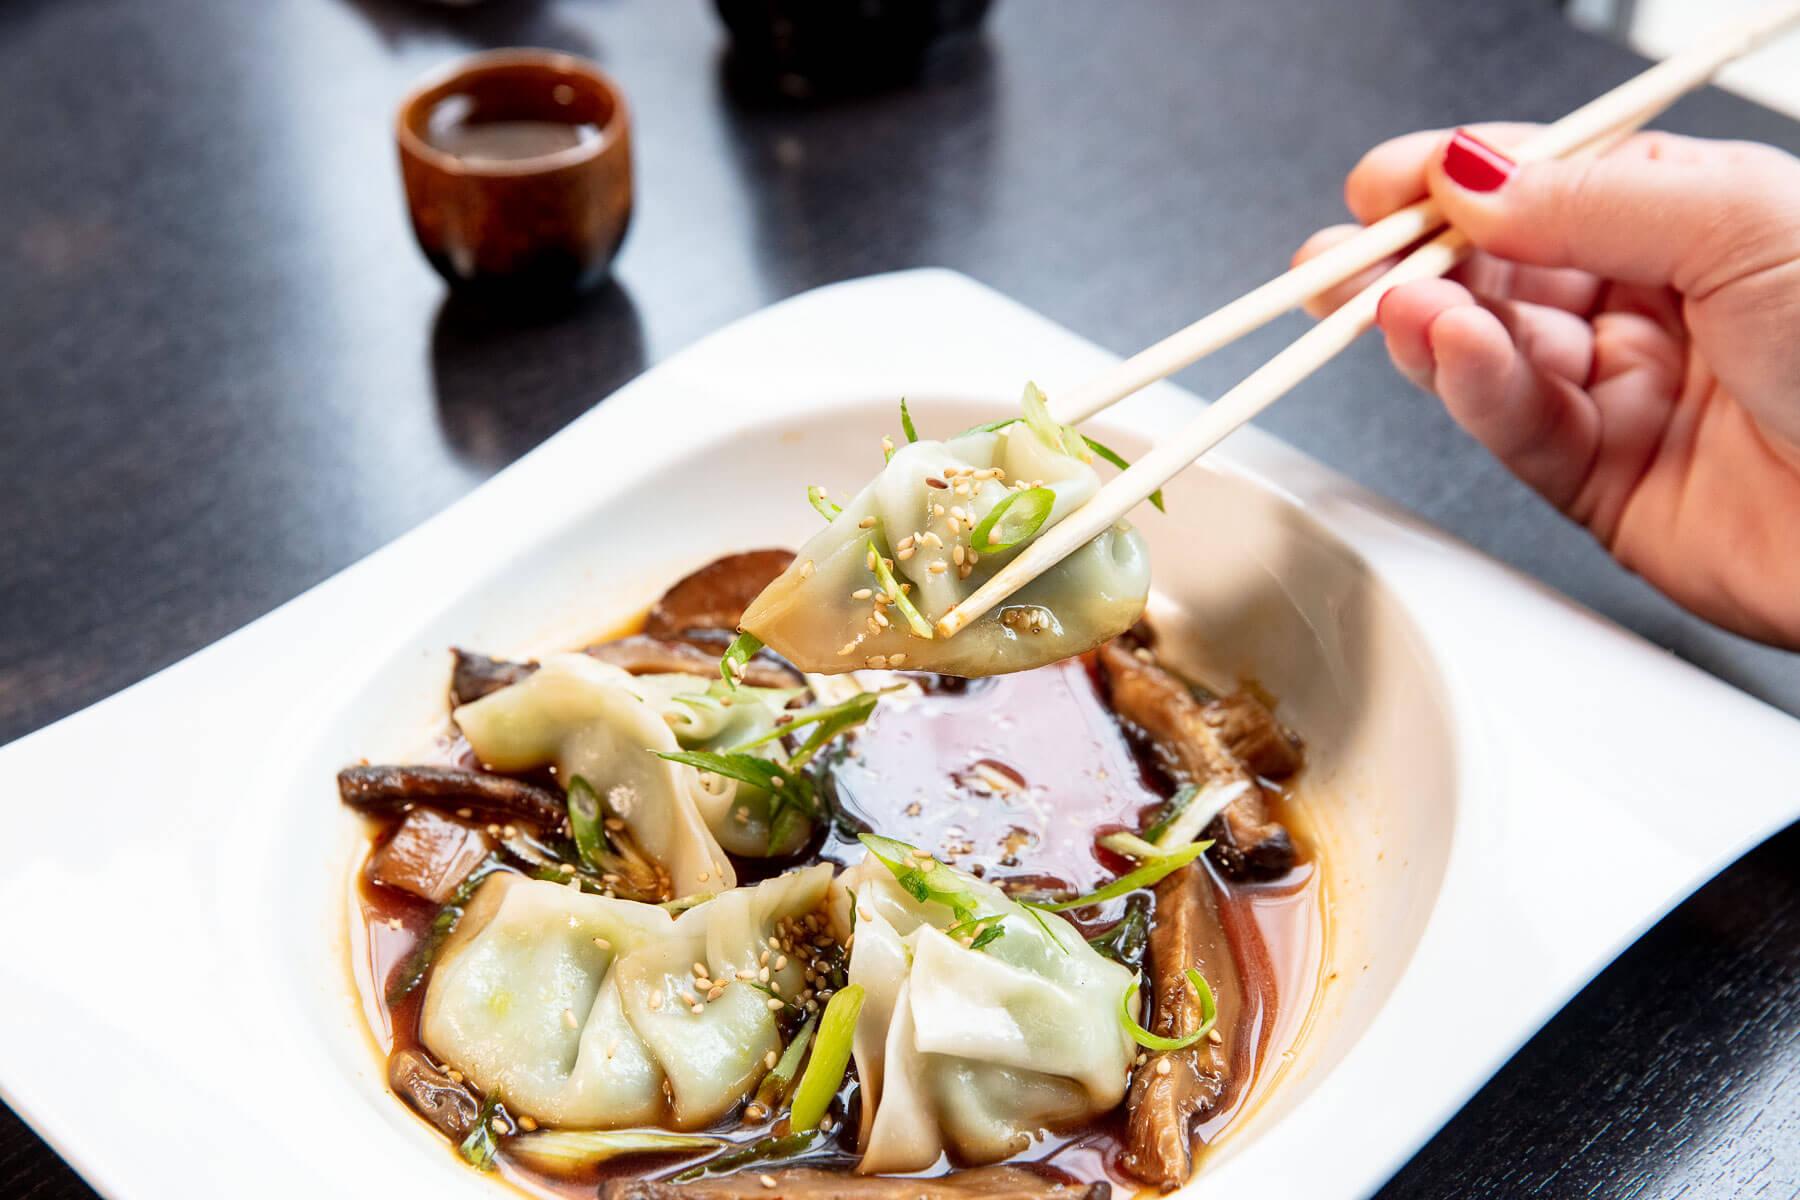 Lifestyle: Edamame Dumplings